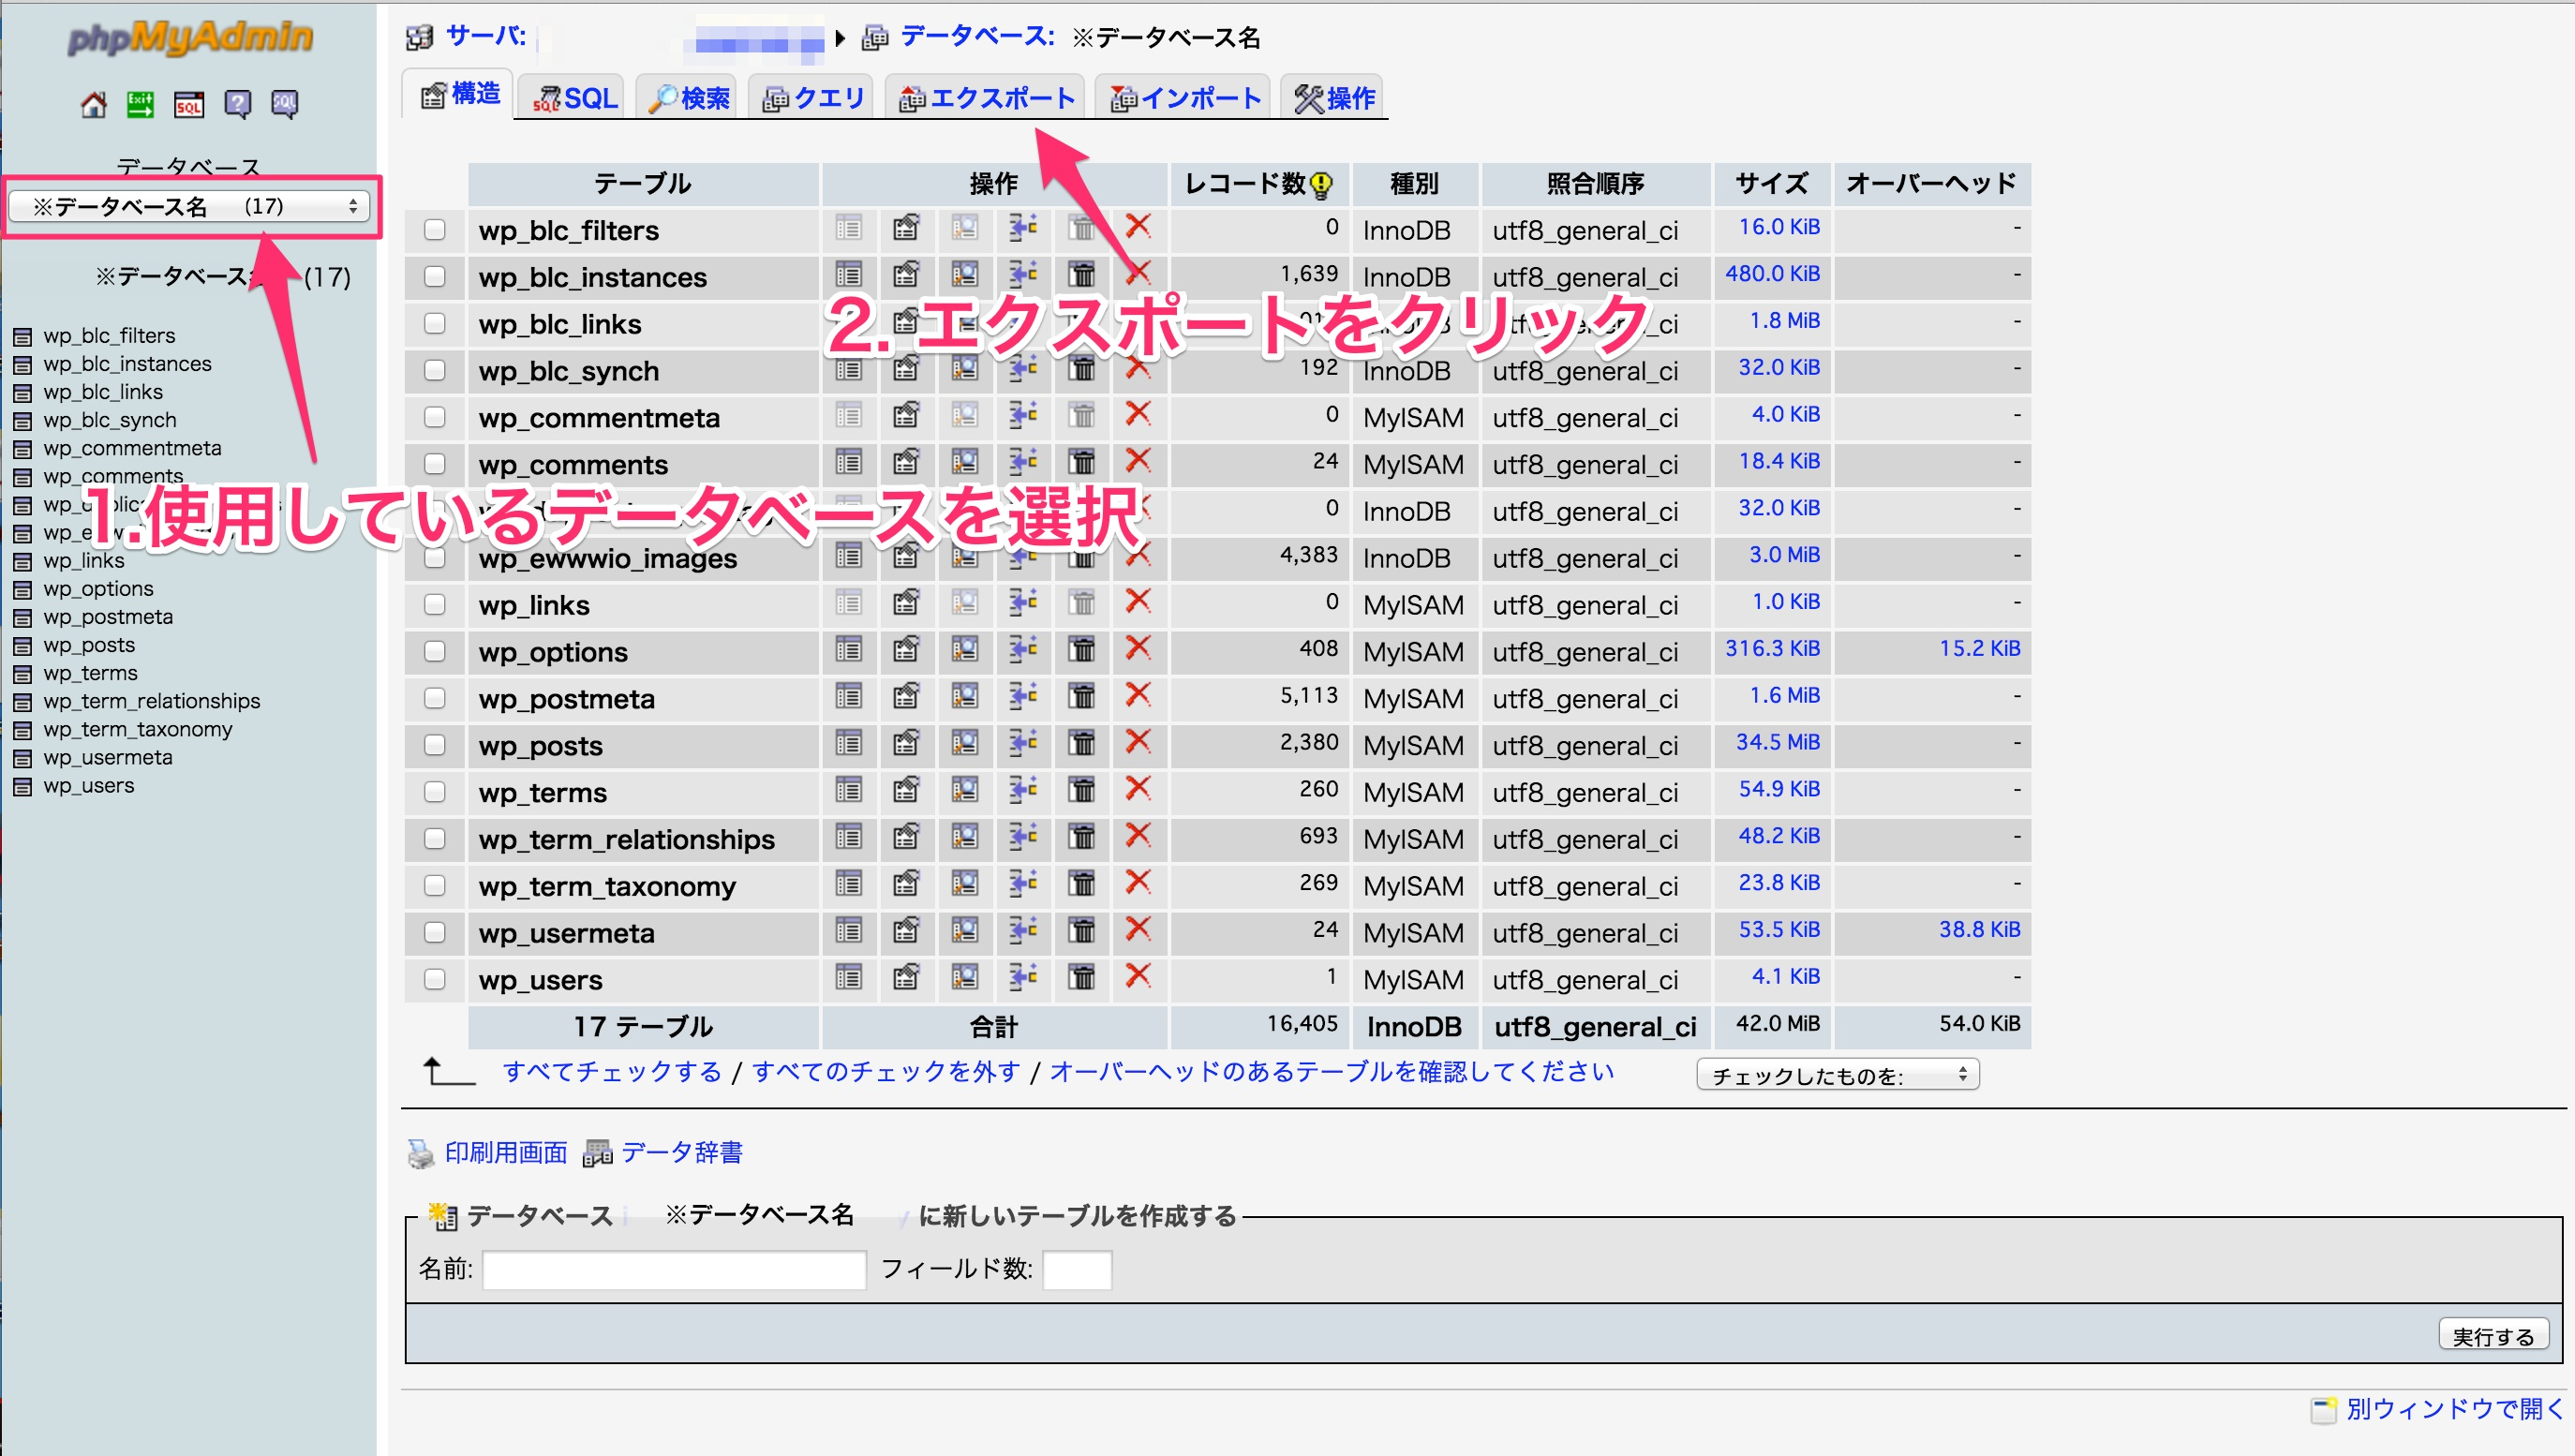 WordPressサーバー引っ越しで使うphpMyAdminにてデータベースをエクスポート1